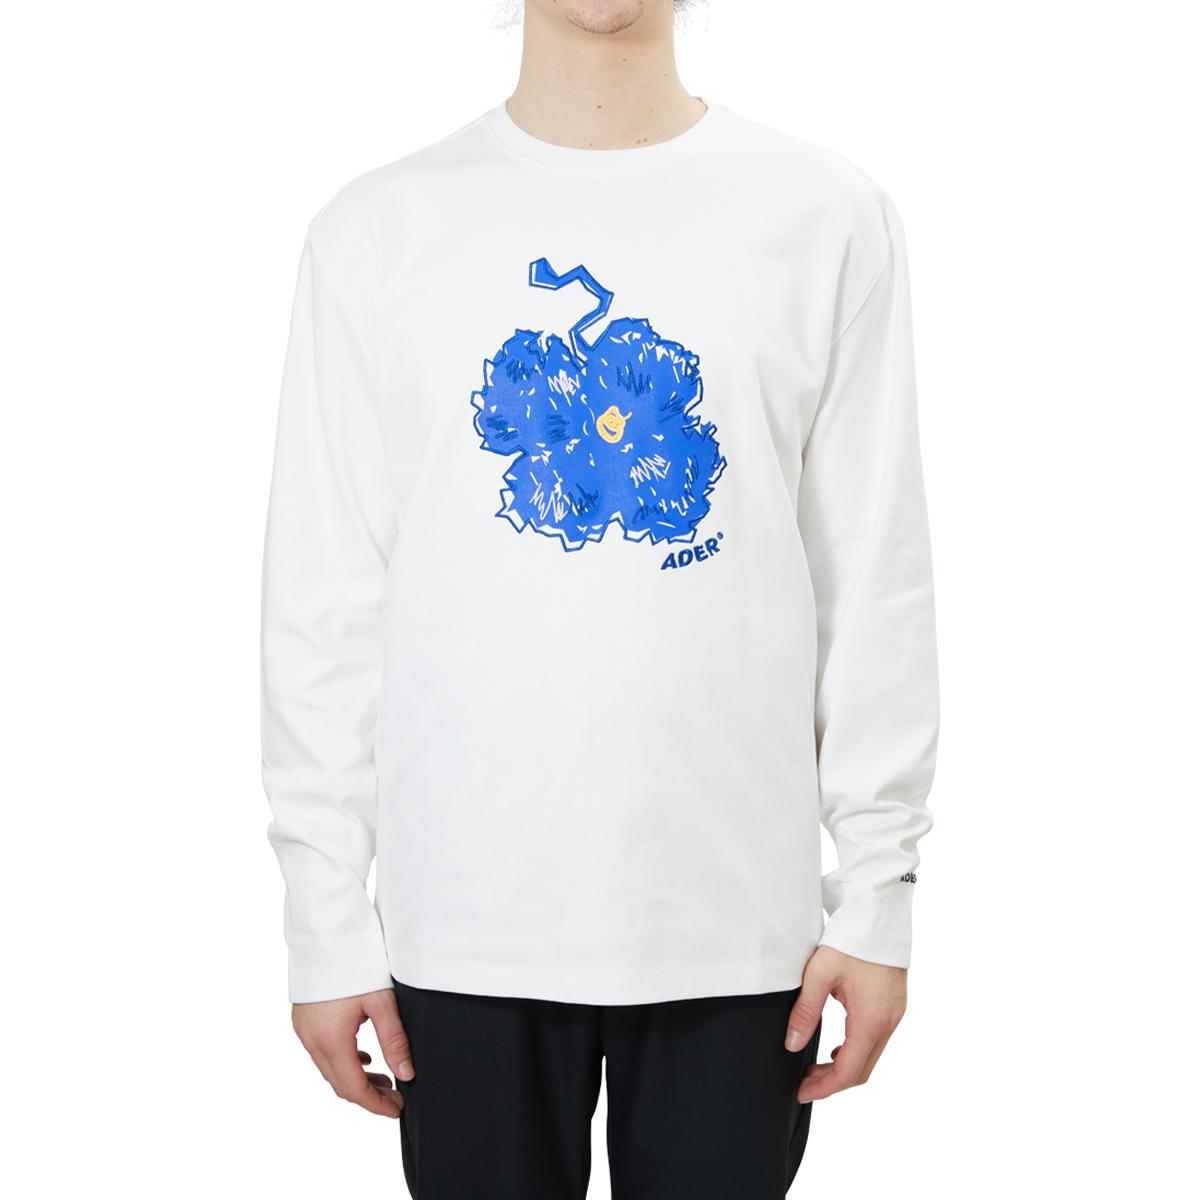 ADER Error Bluessom Sweatshirt